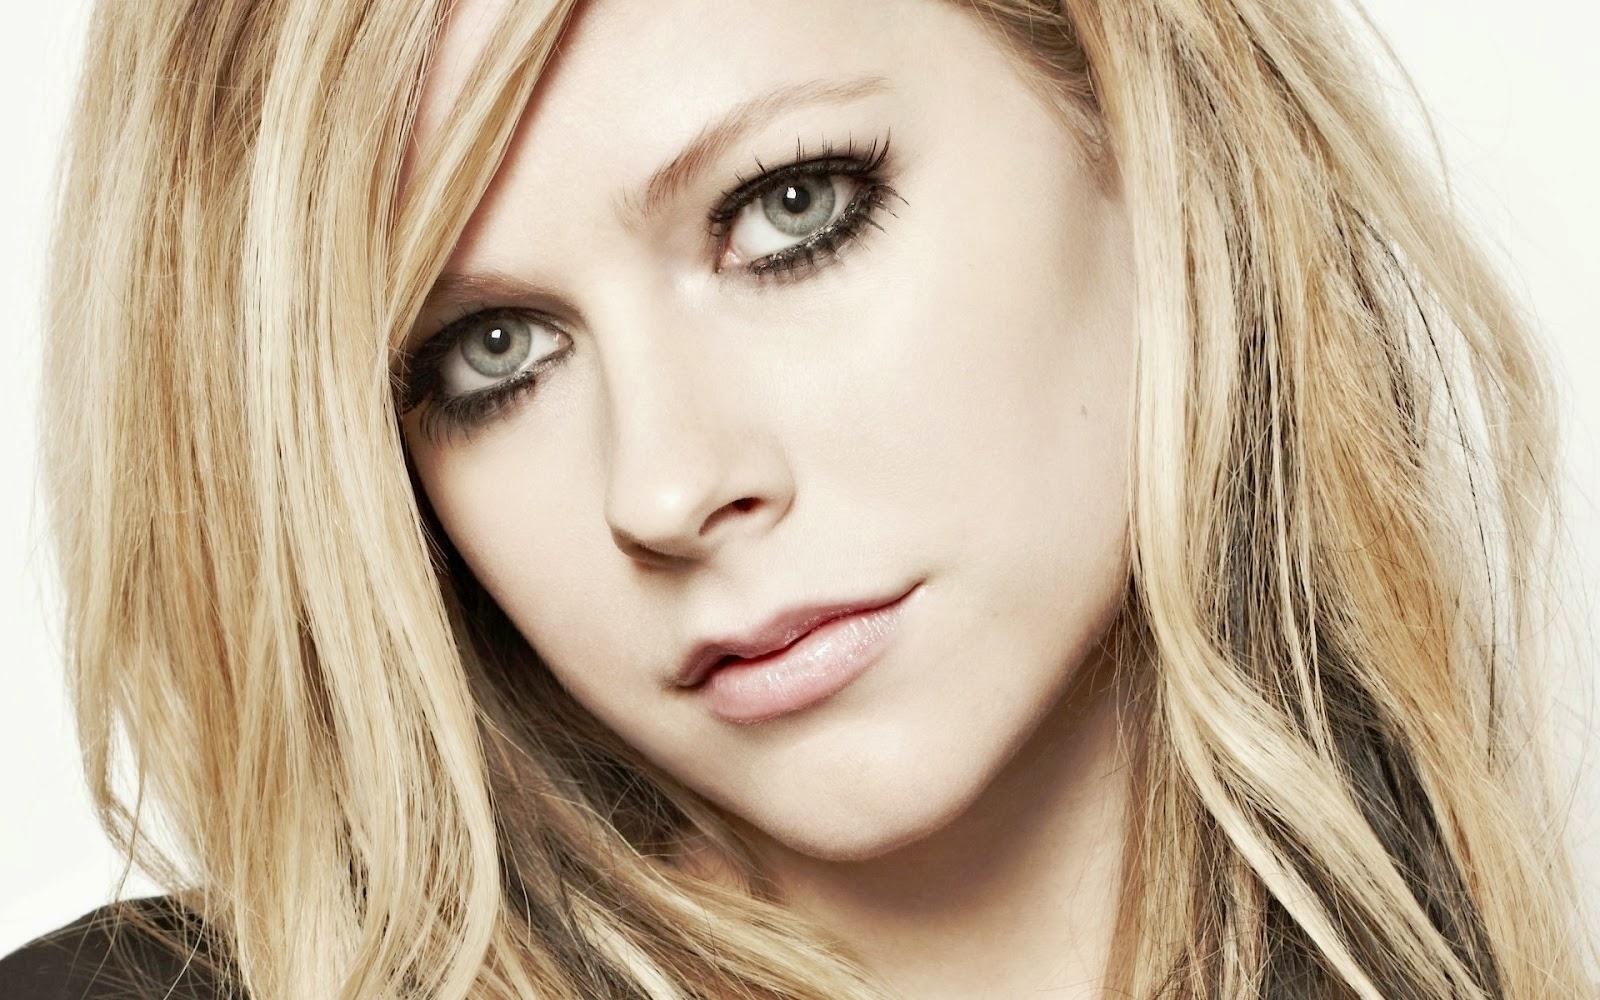 Avril Lavigne Makeup Avril Lavigne Eye Makeup Addiction 12